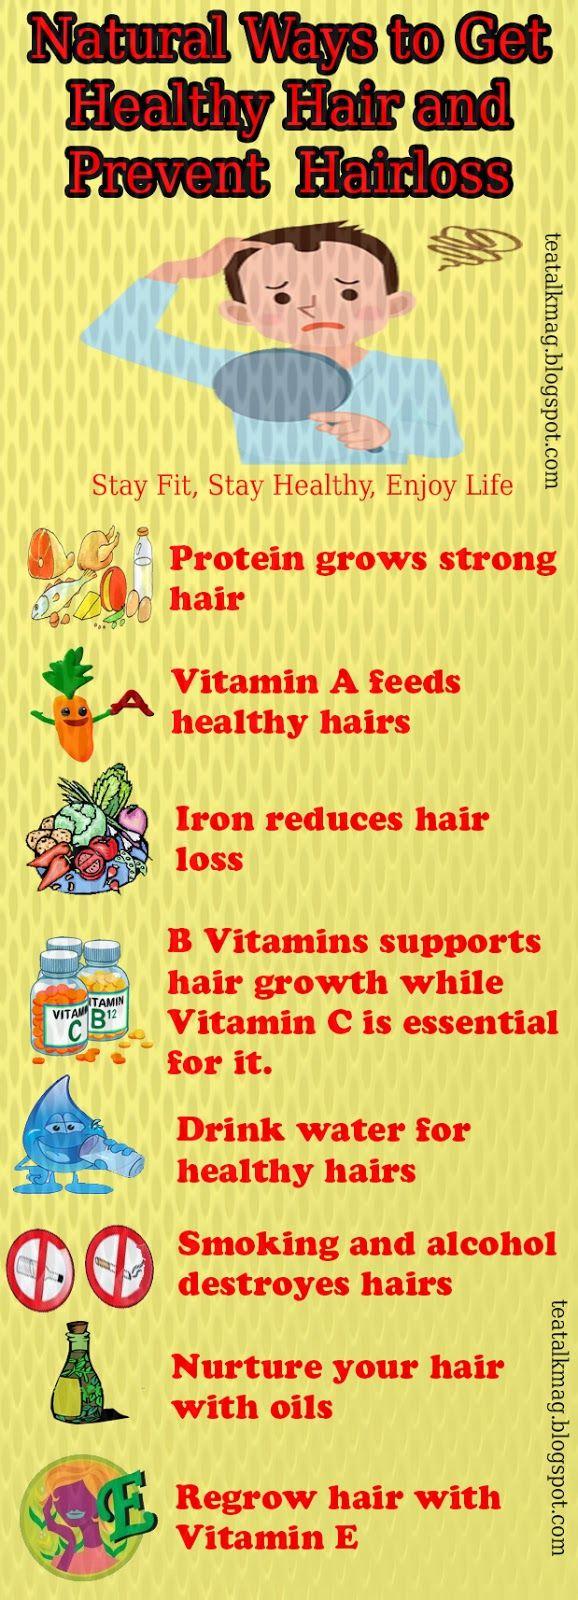 Natural Ways to Prevent and Restore Hair Loss #hairloss #hair #natural